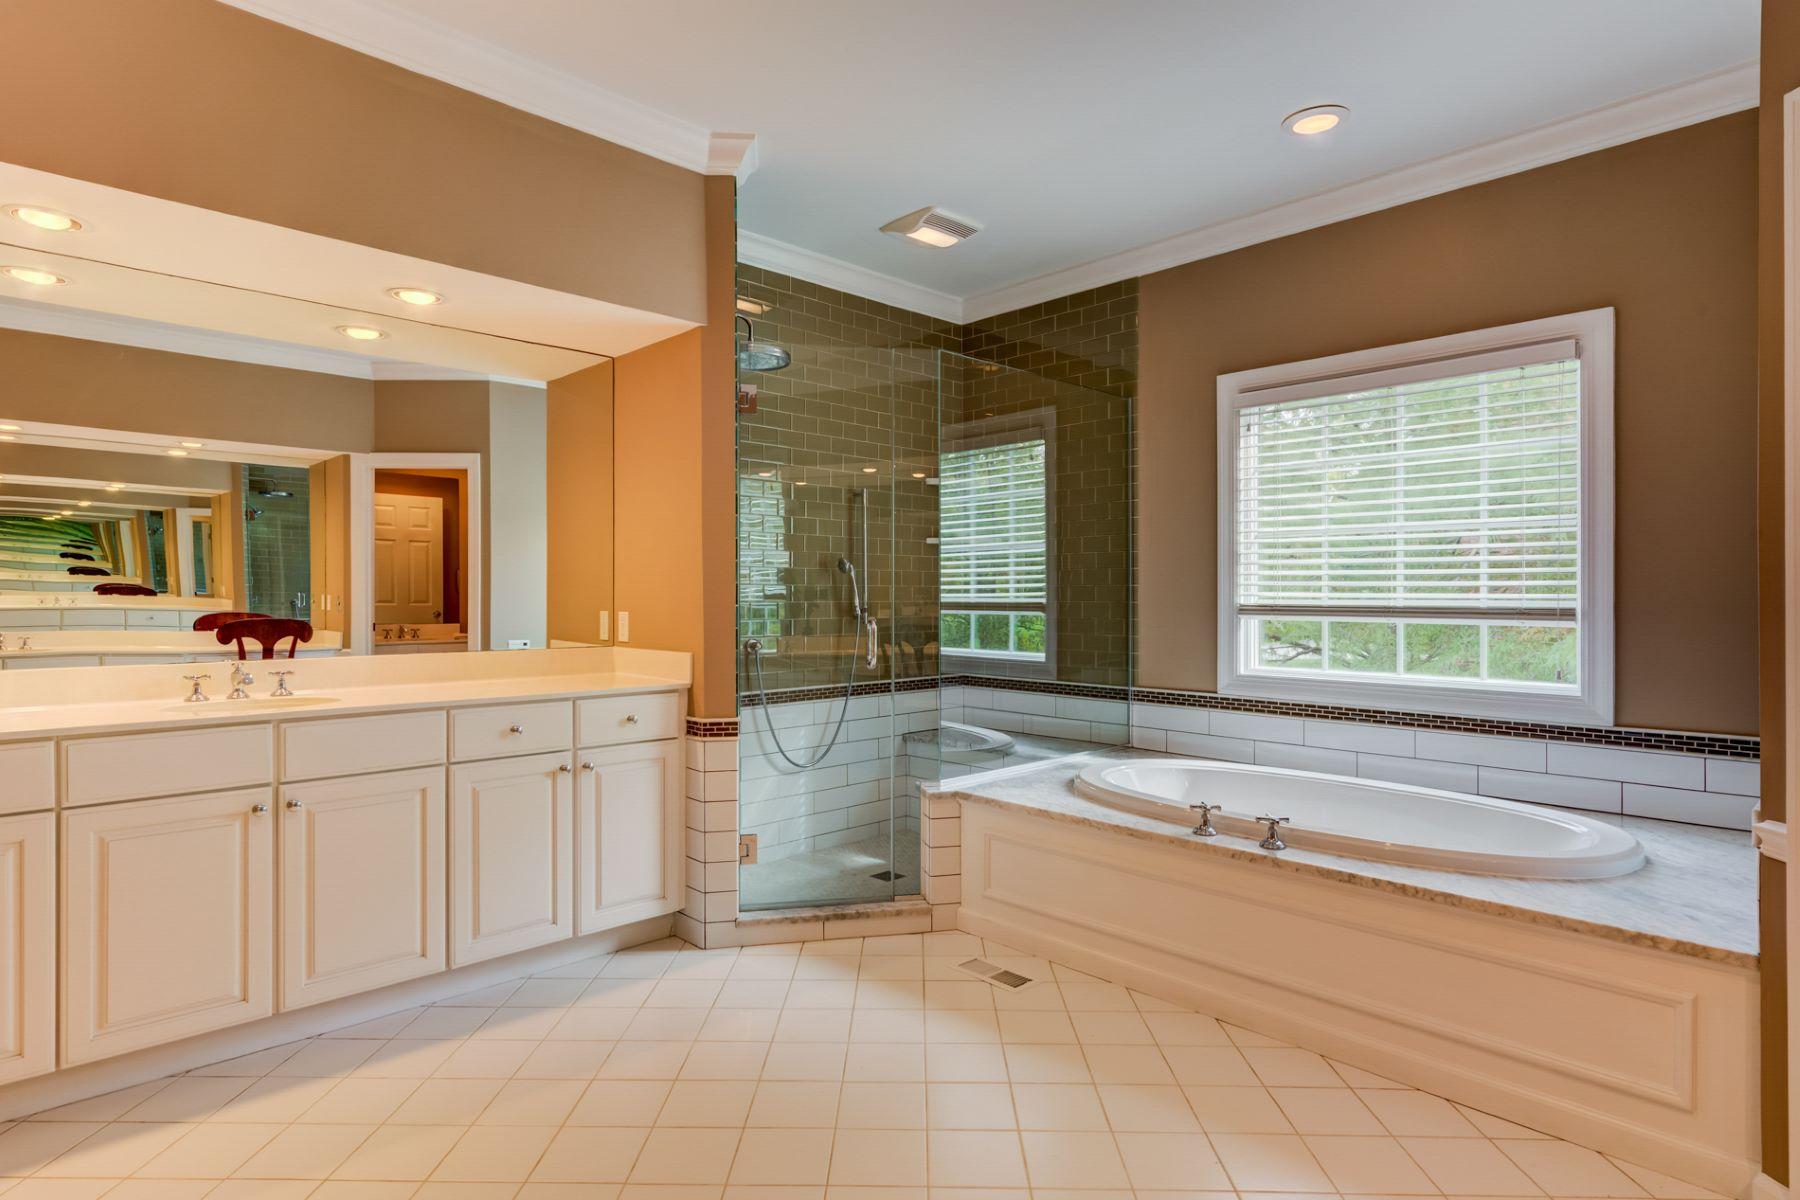 Additional photo for property listing at Steeplechase Lane 476 Steeplechase Lane Frontenac, Missouri 63131 United States